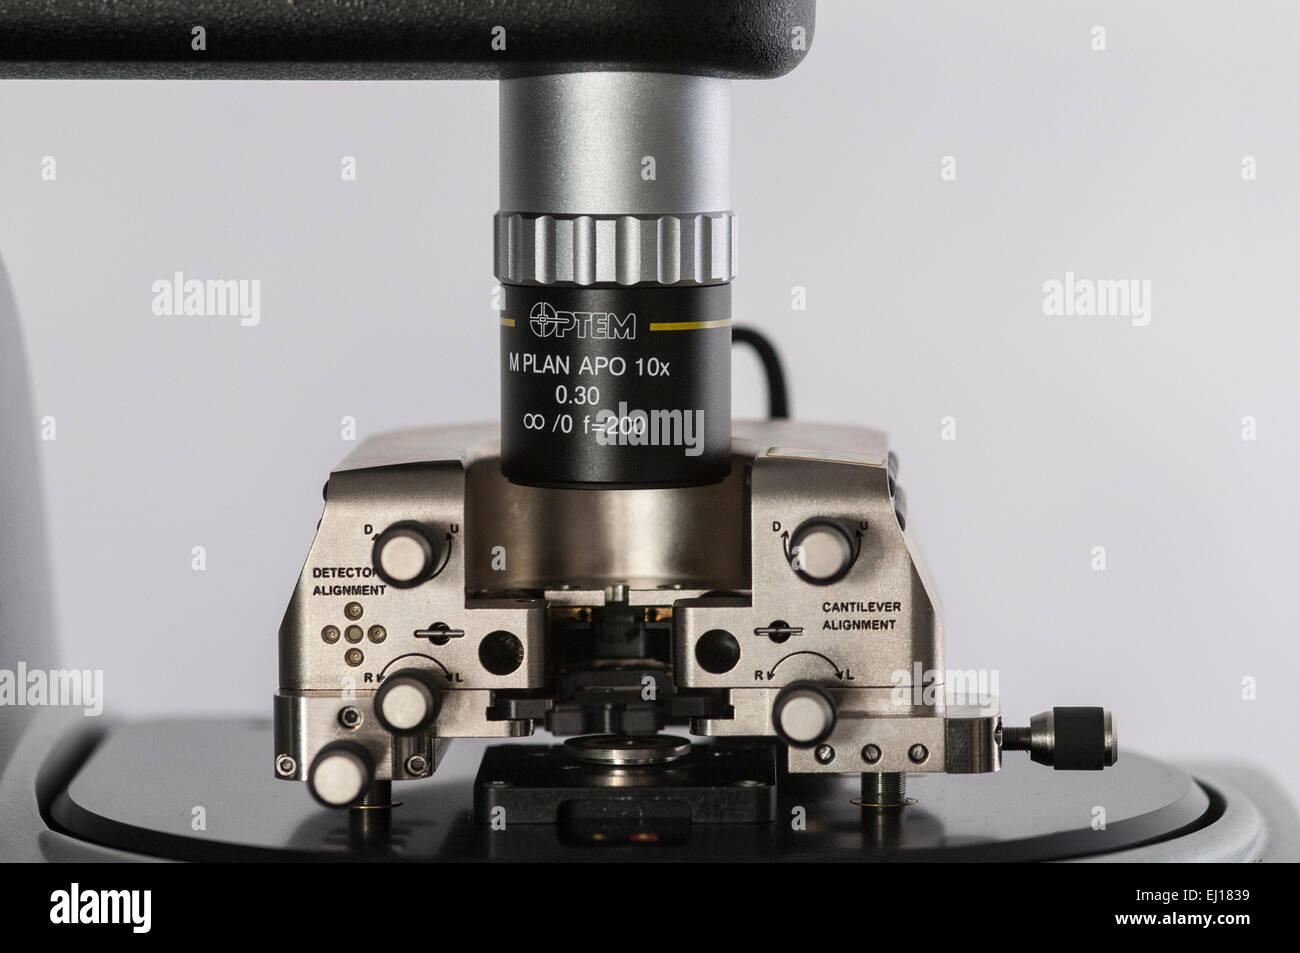 Atomic force microscope - Stock Image